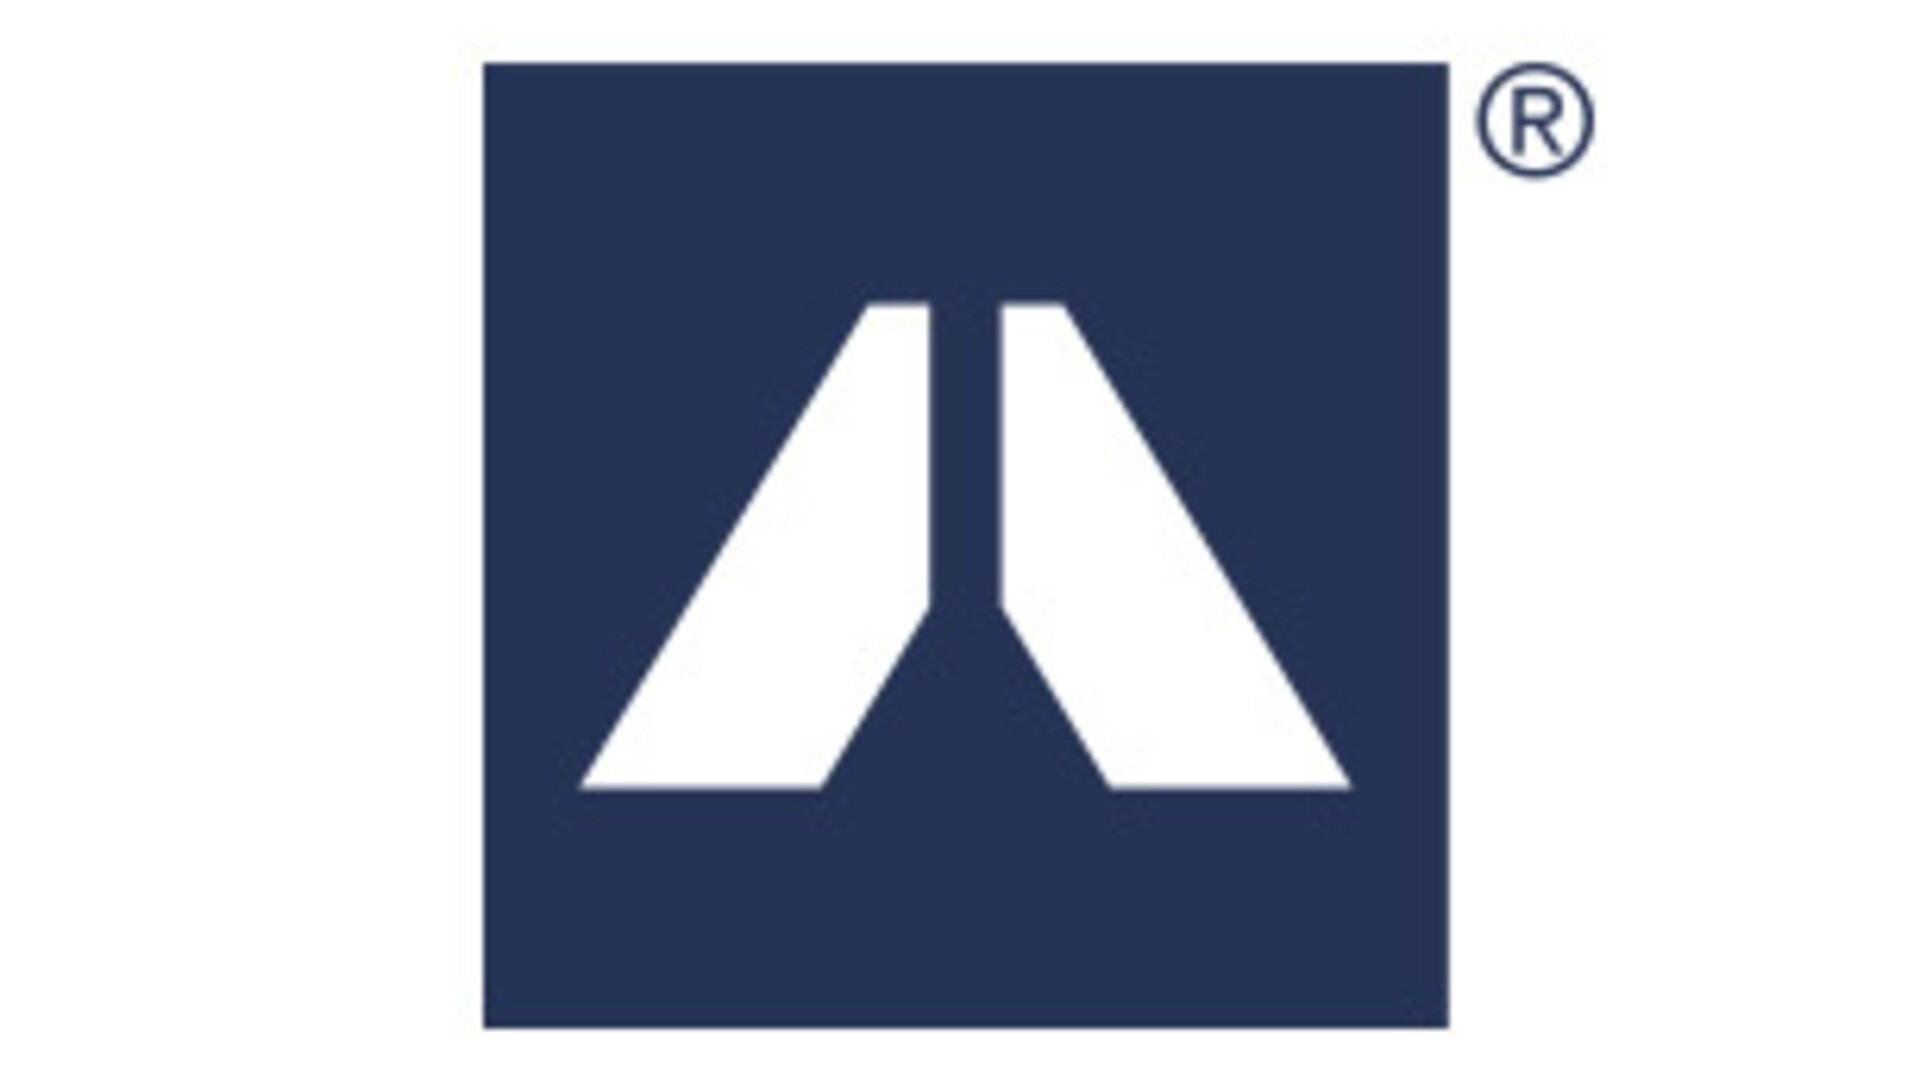 RGB Rockpanel® symbol